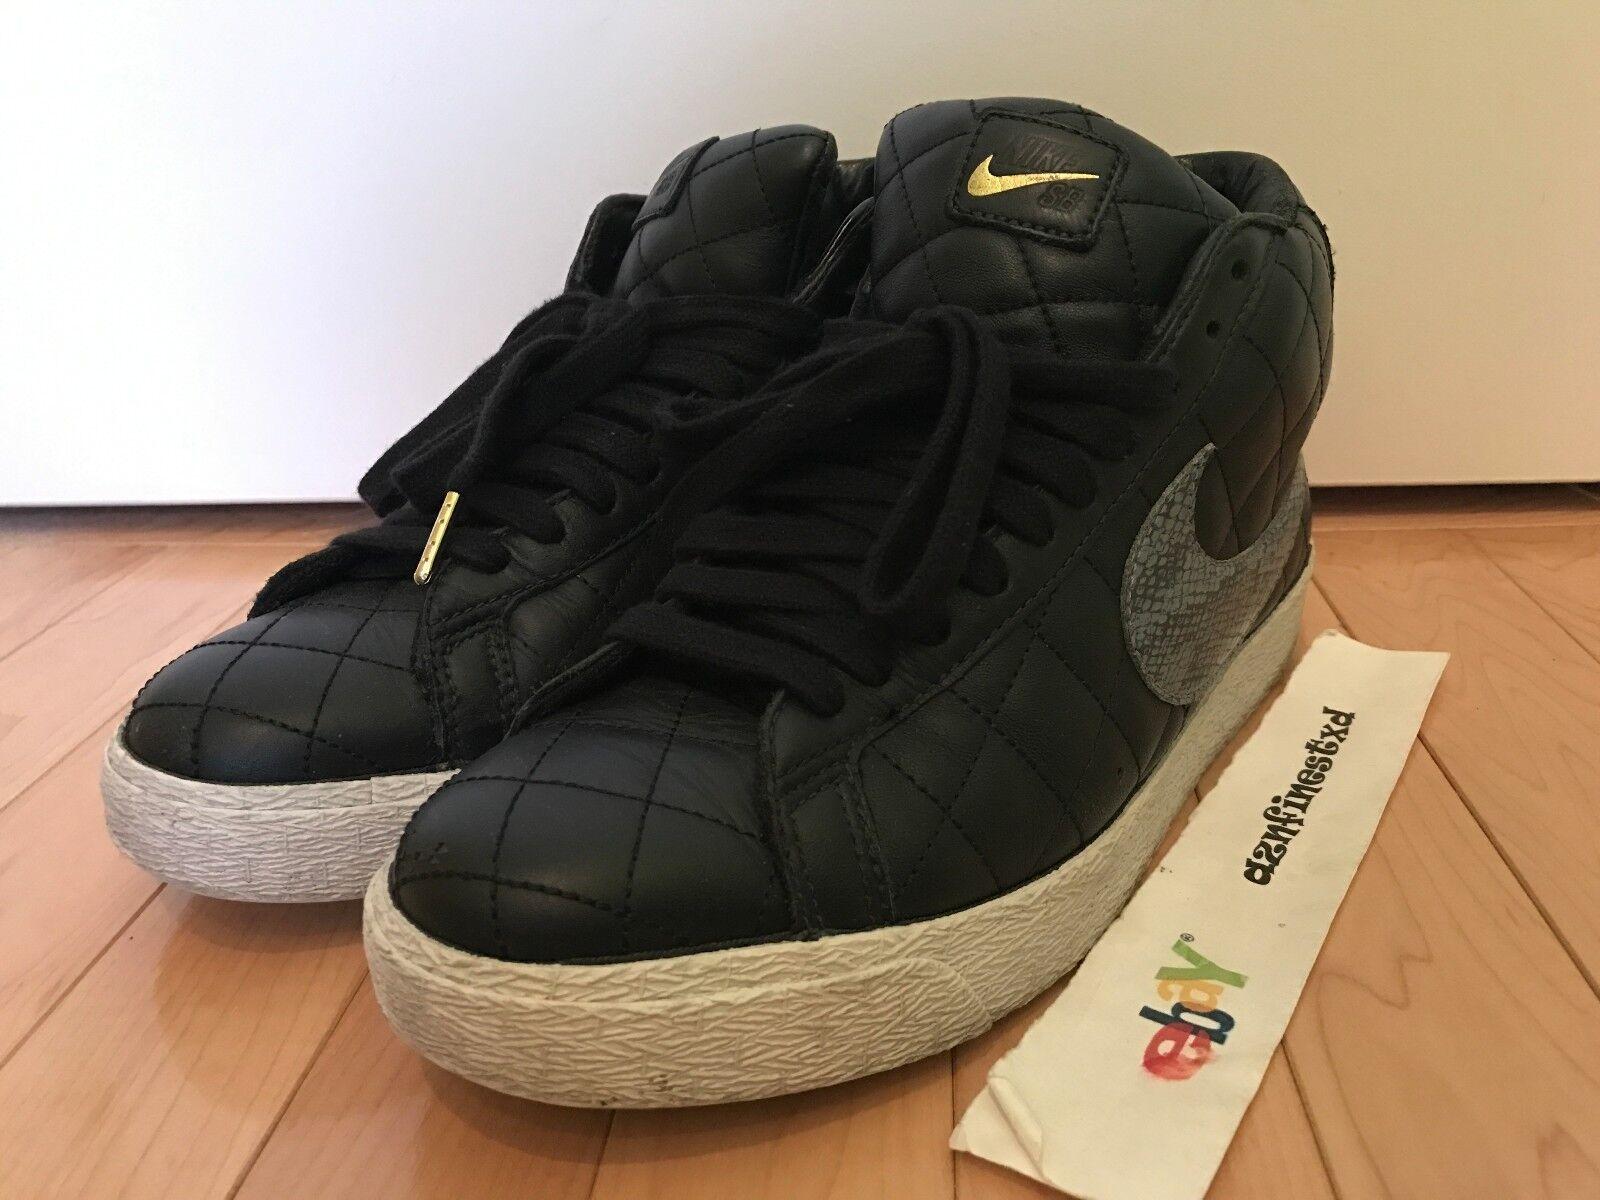 Nike Blazer SB Supreme Black Sz 9 Used 313962-001 dunk